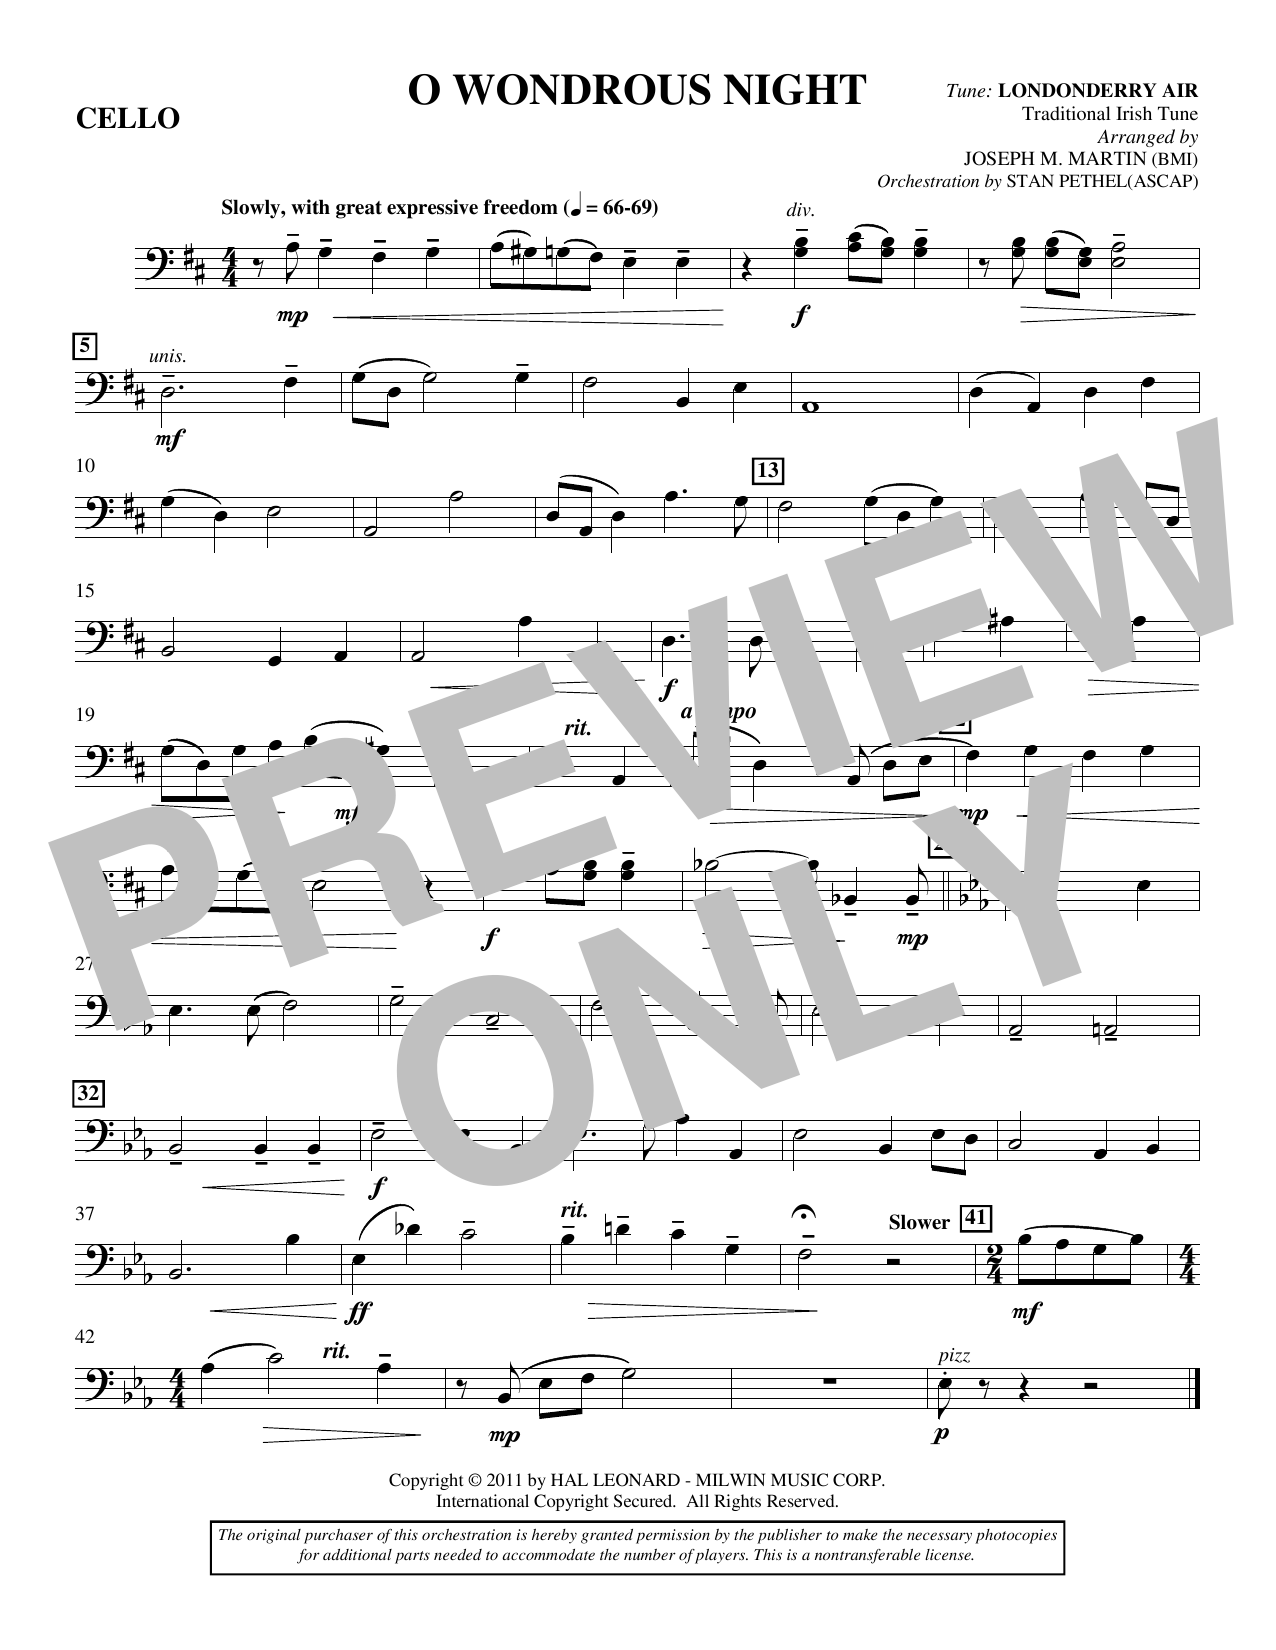 Joseph M. Martin O Wondrous Night - Cello sheet music notes and chords. Download Printable PDF.